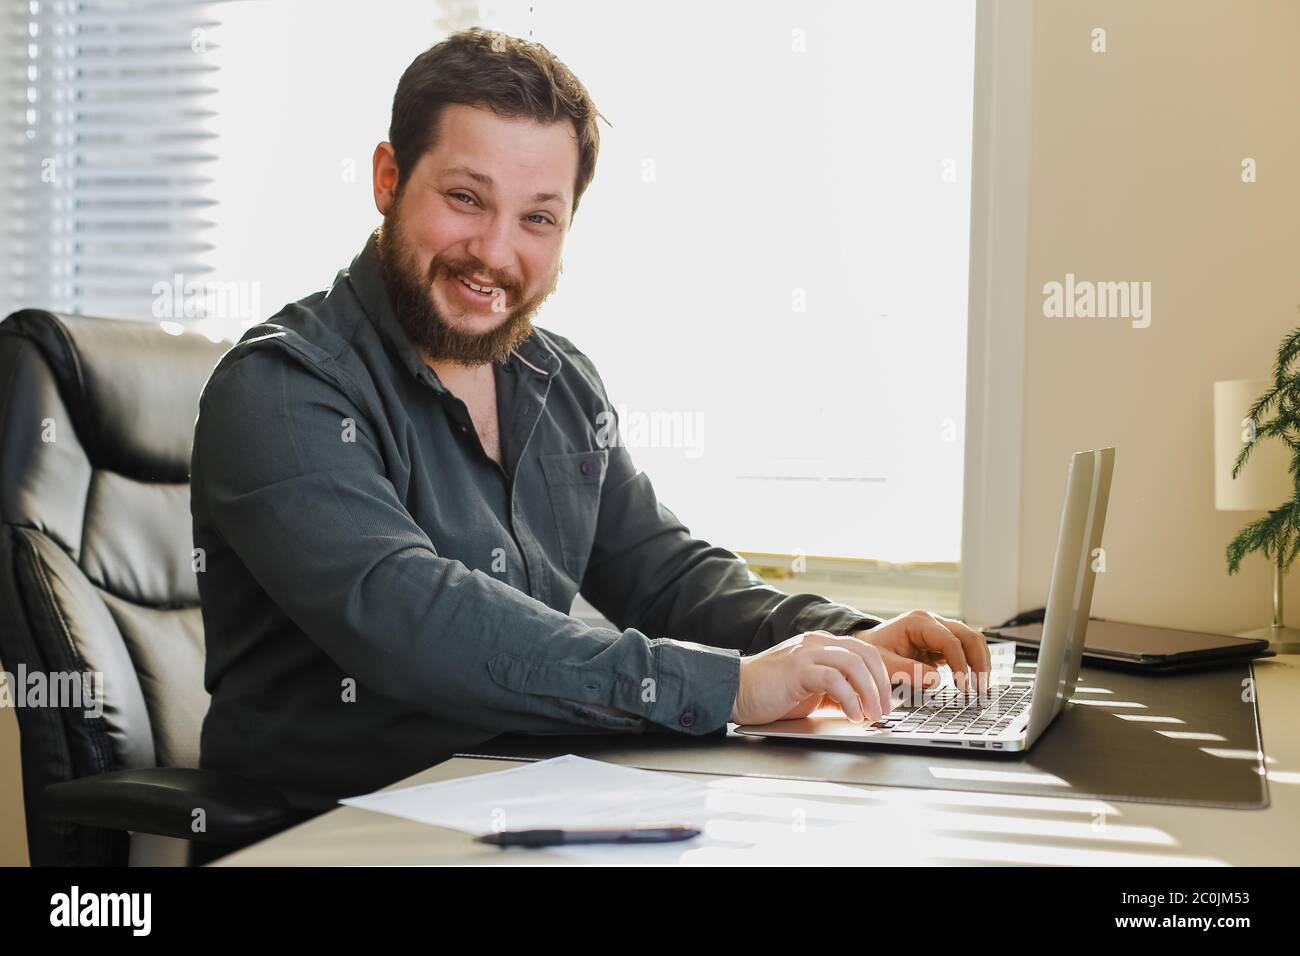 Web Developer Sitting At Office Desk Working On Laptop Computer Stock Photo Alamy